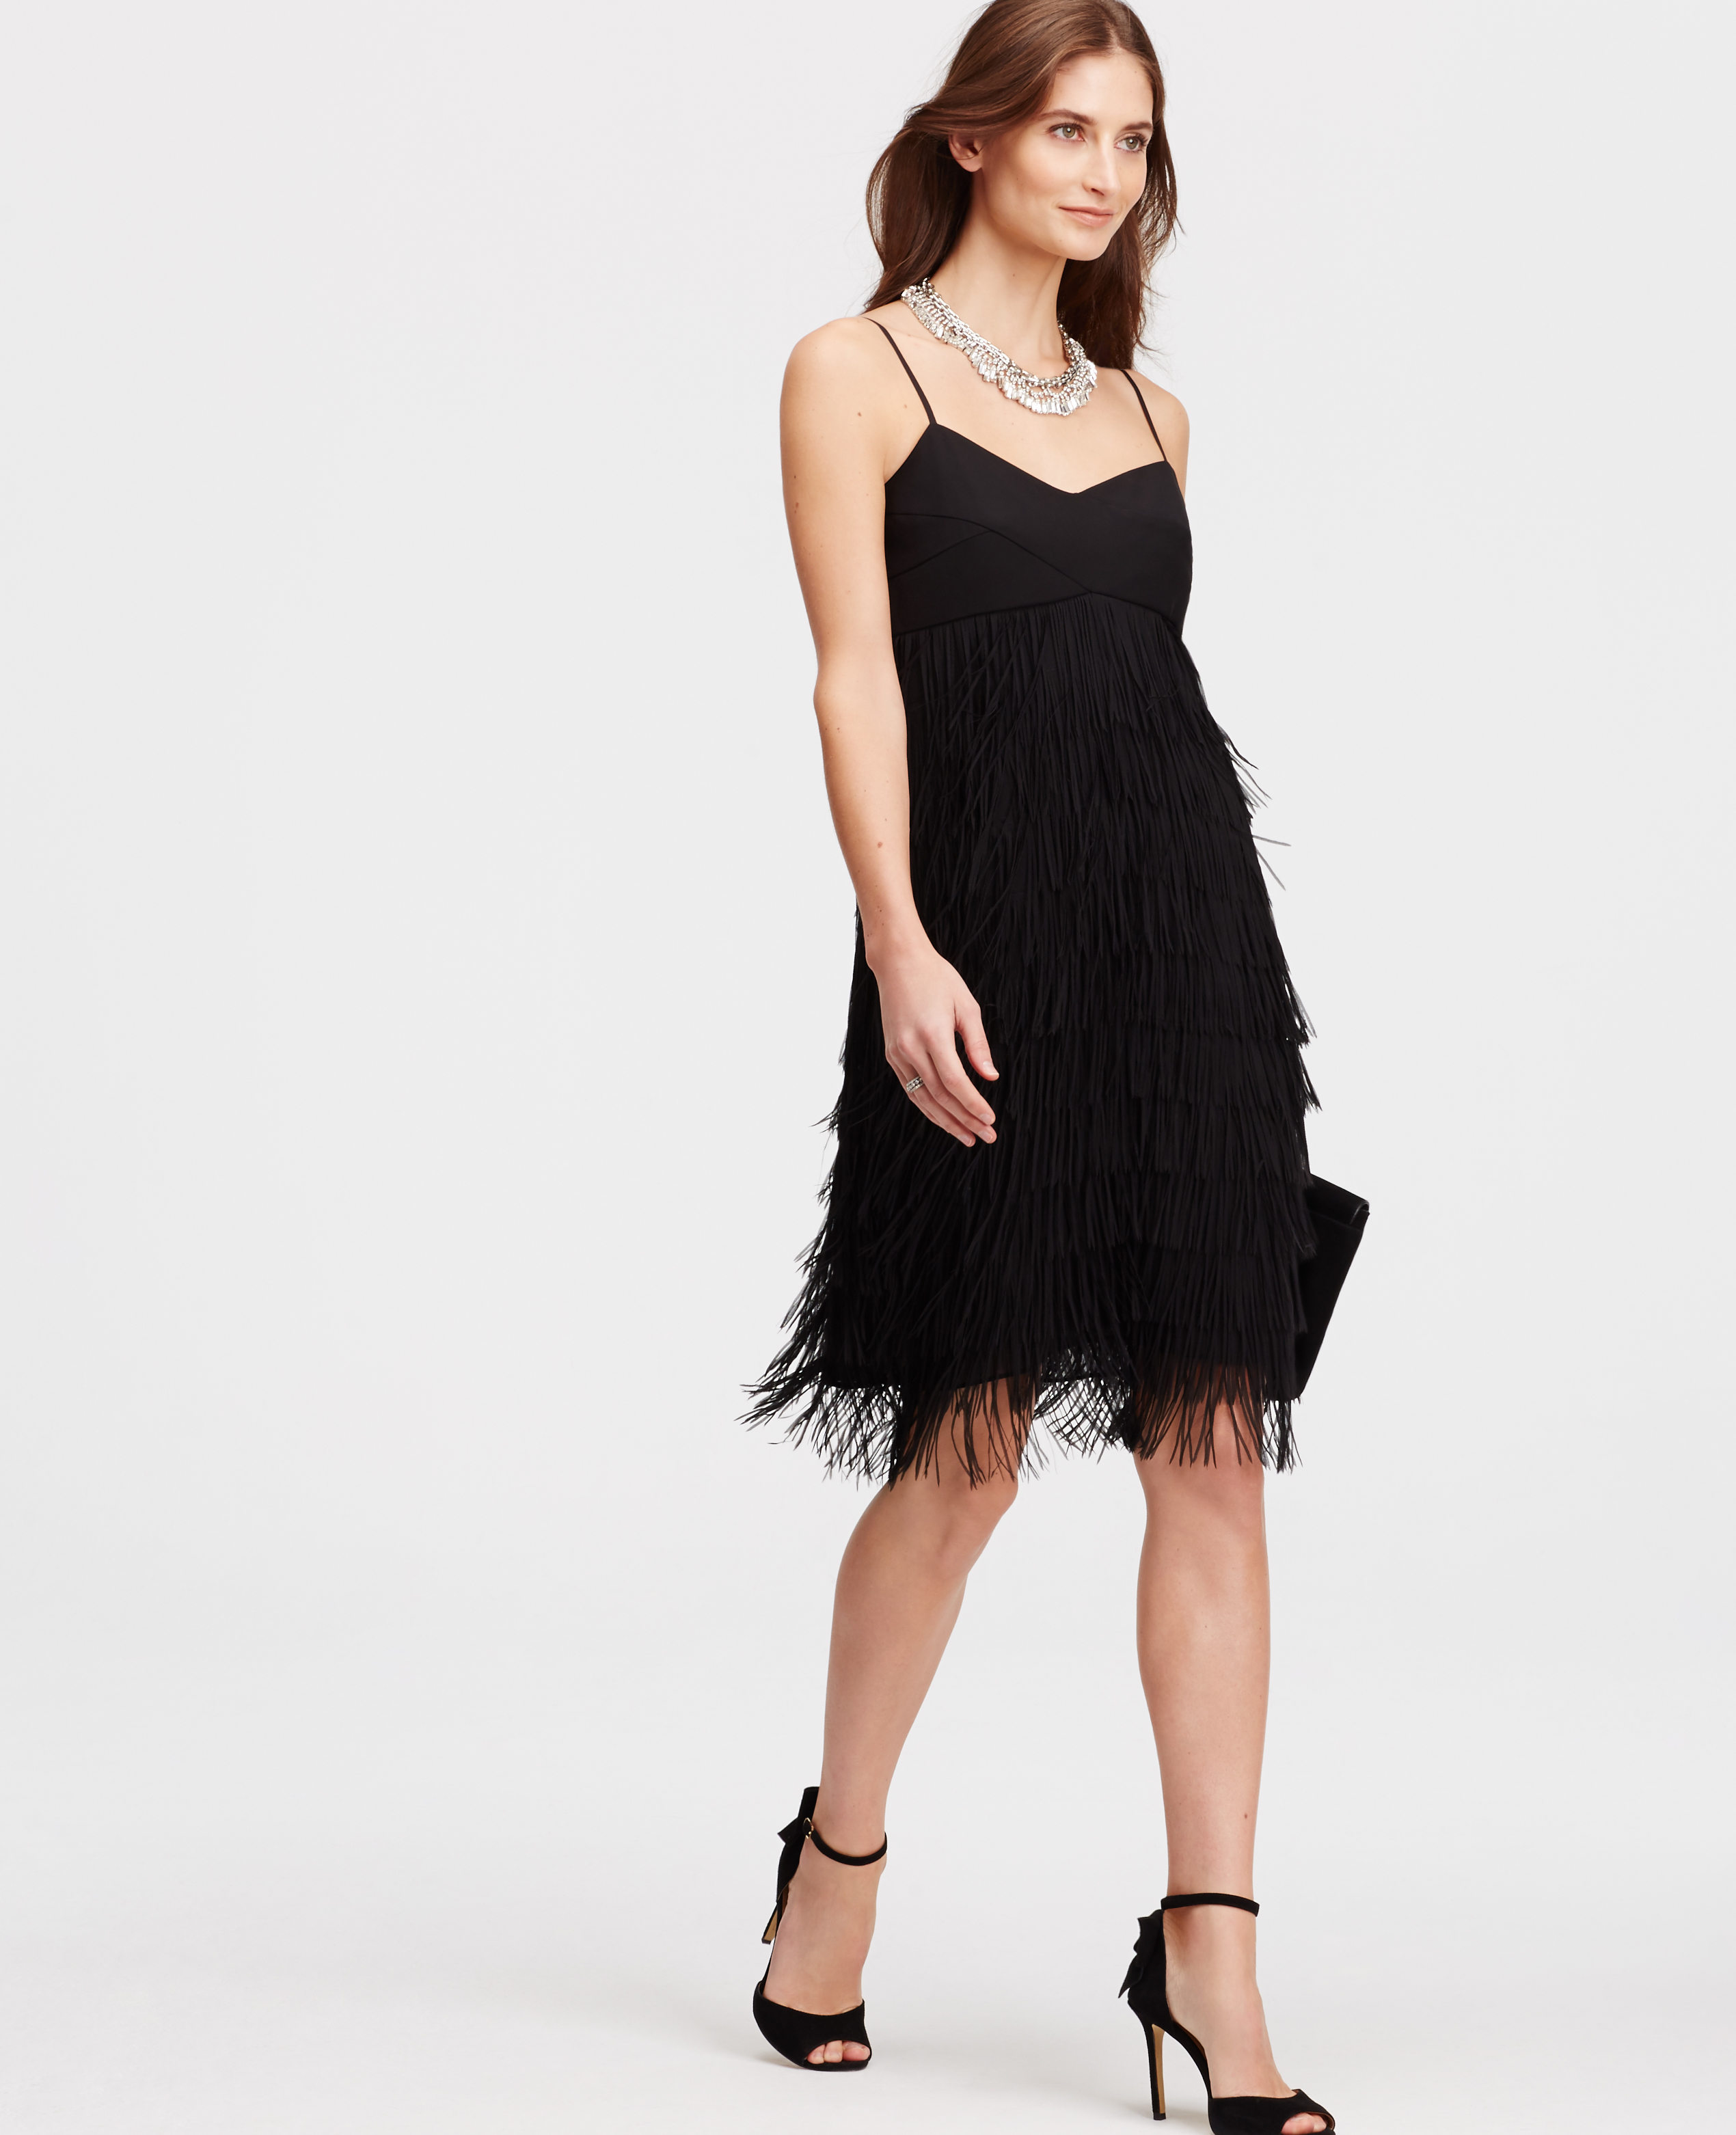 Lyst - Ann Taylor Strappy Fringe Dress in Black